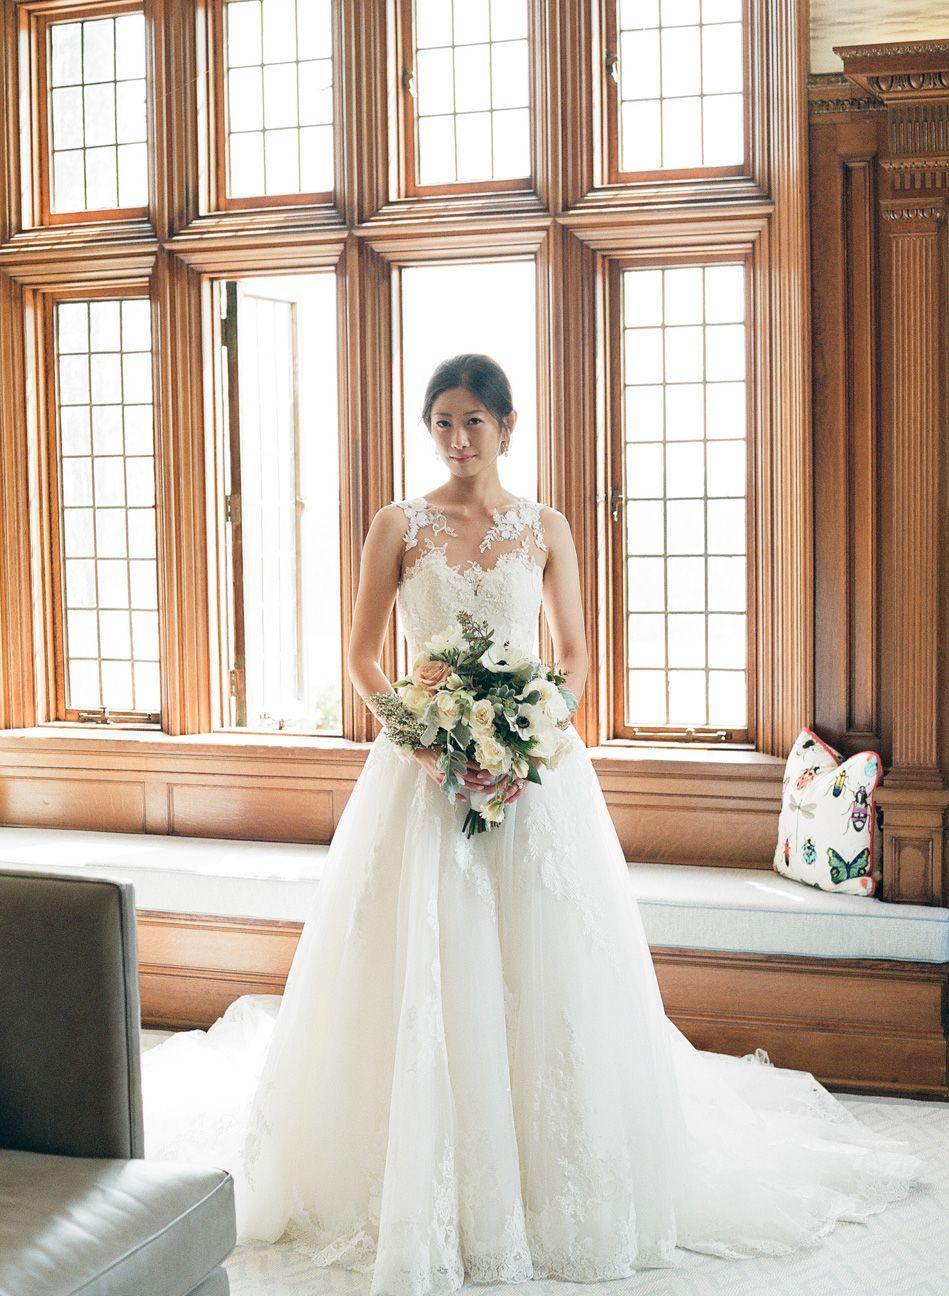 KarenHillPhotography-Zhu-Wedding-0179.jpg